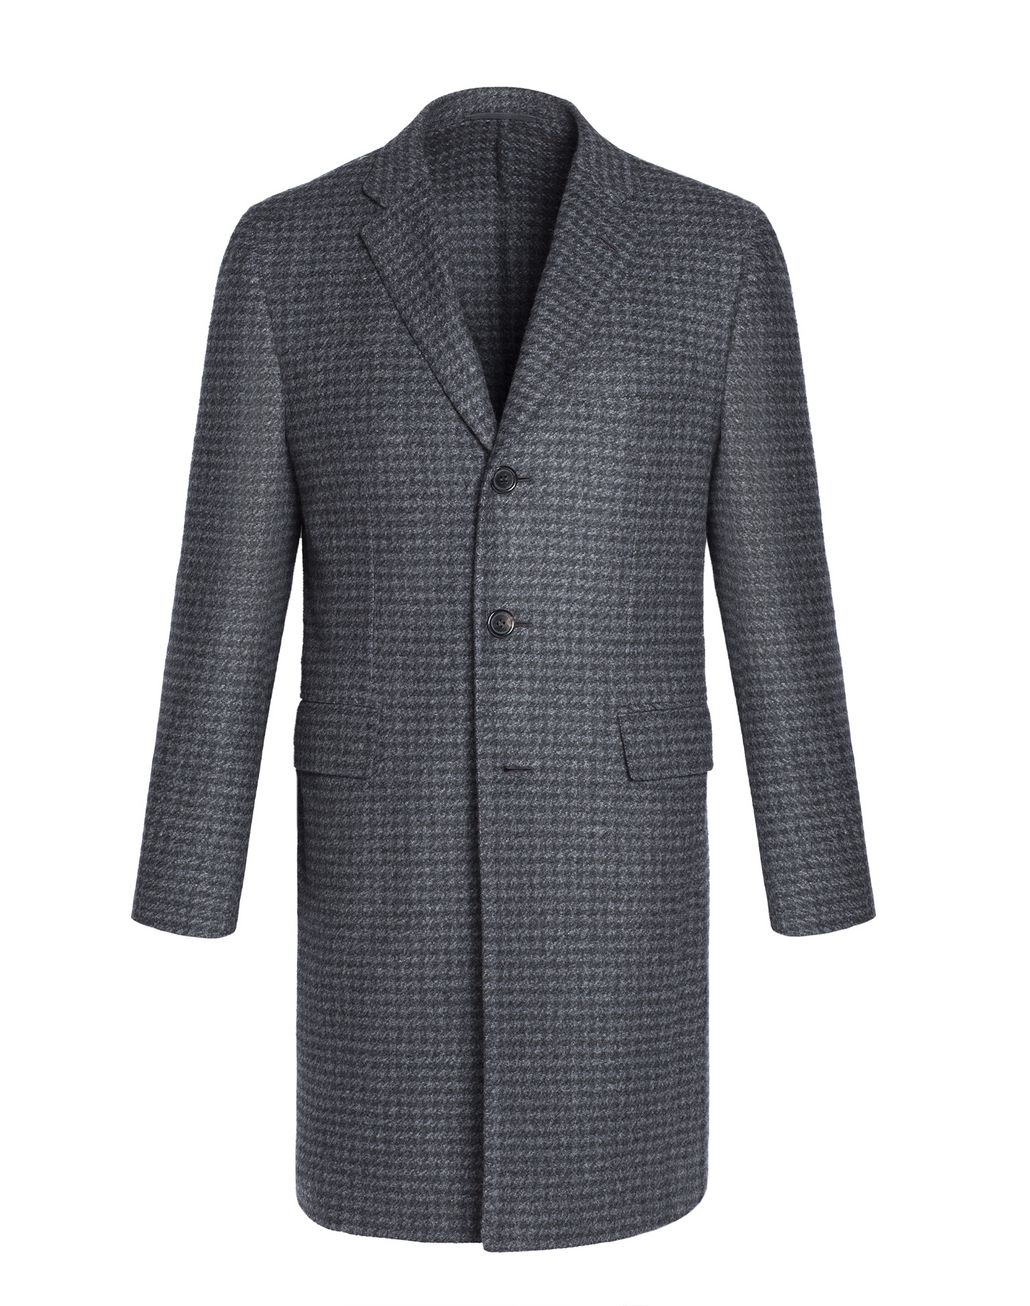 BRIONI Grey Macro Pied de Poule Plume Coat in Cashmere Outerwear U f